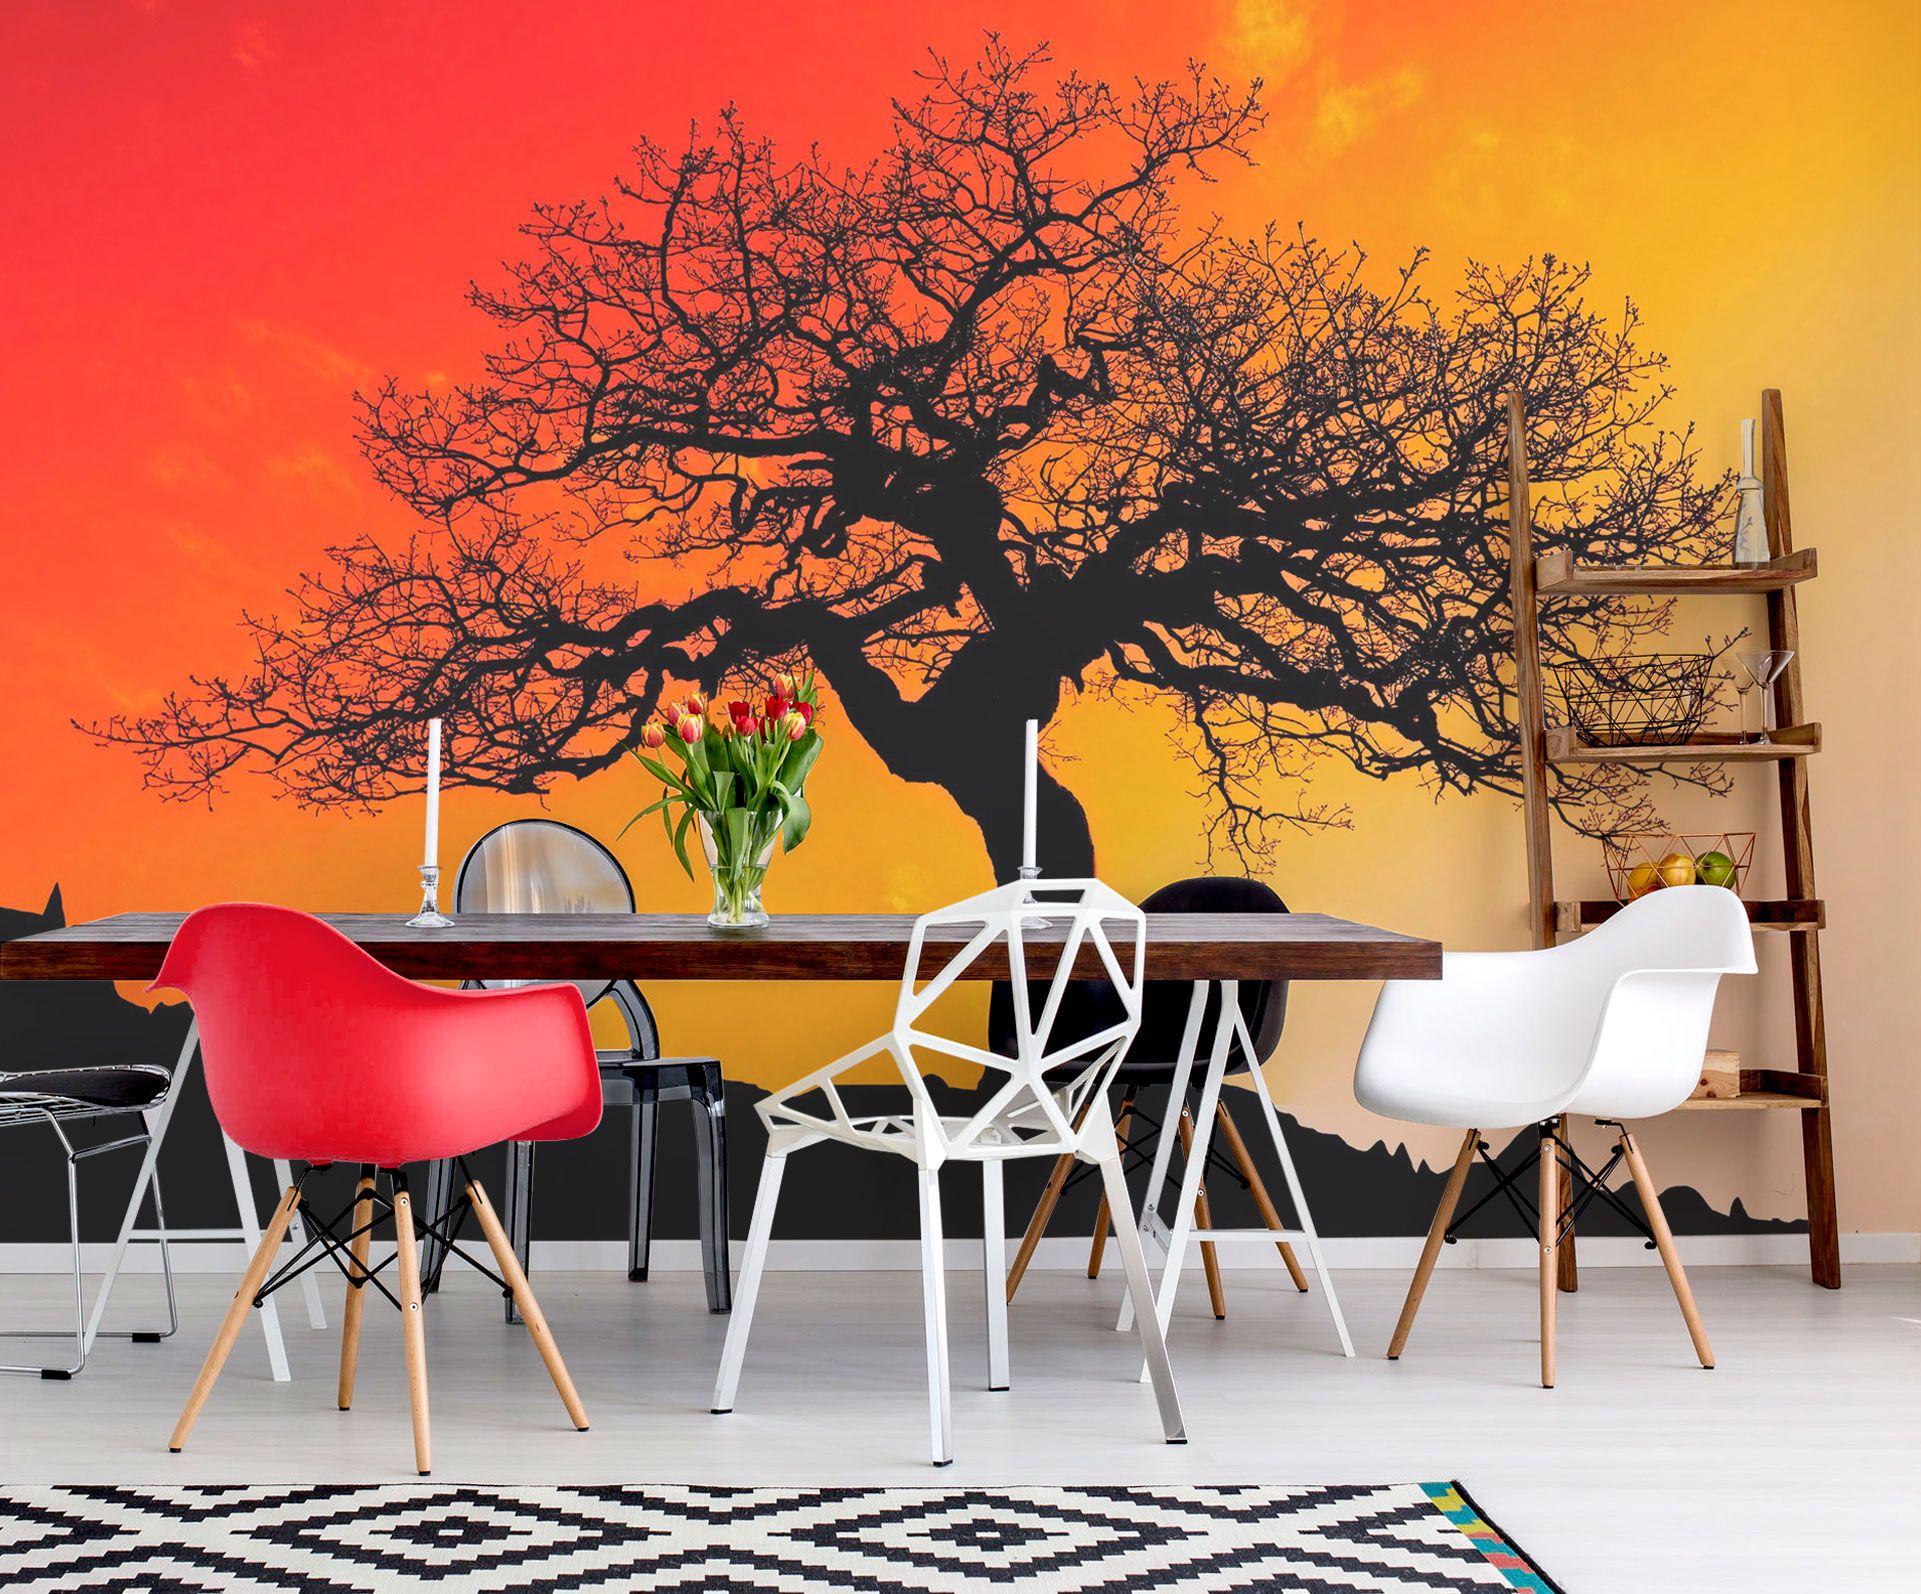 New Wall Mural Design Ideas From Eazywallz Wallpaper Murals For